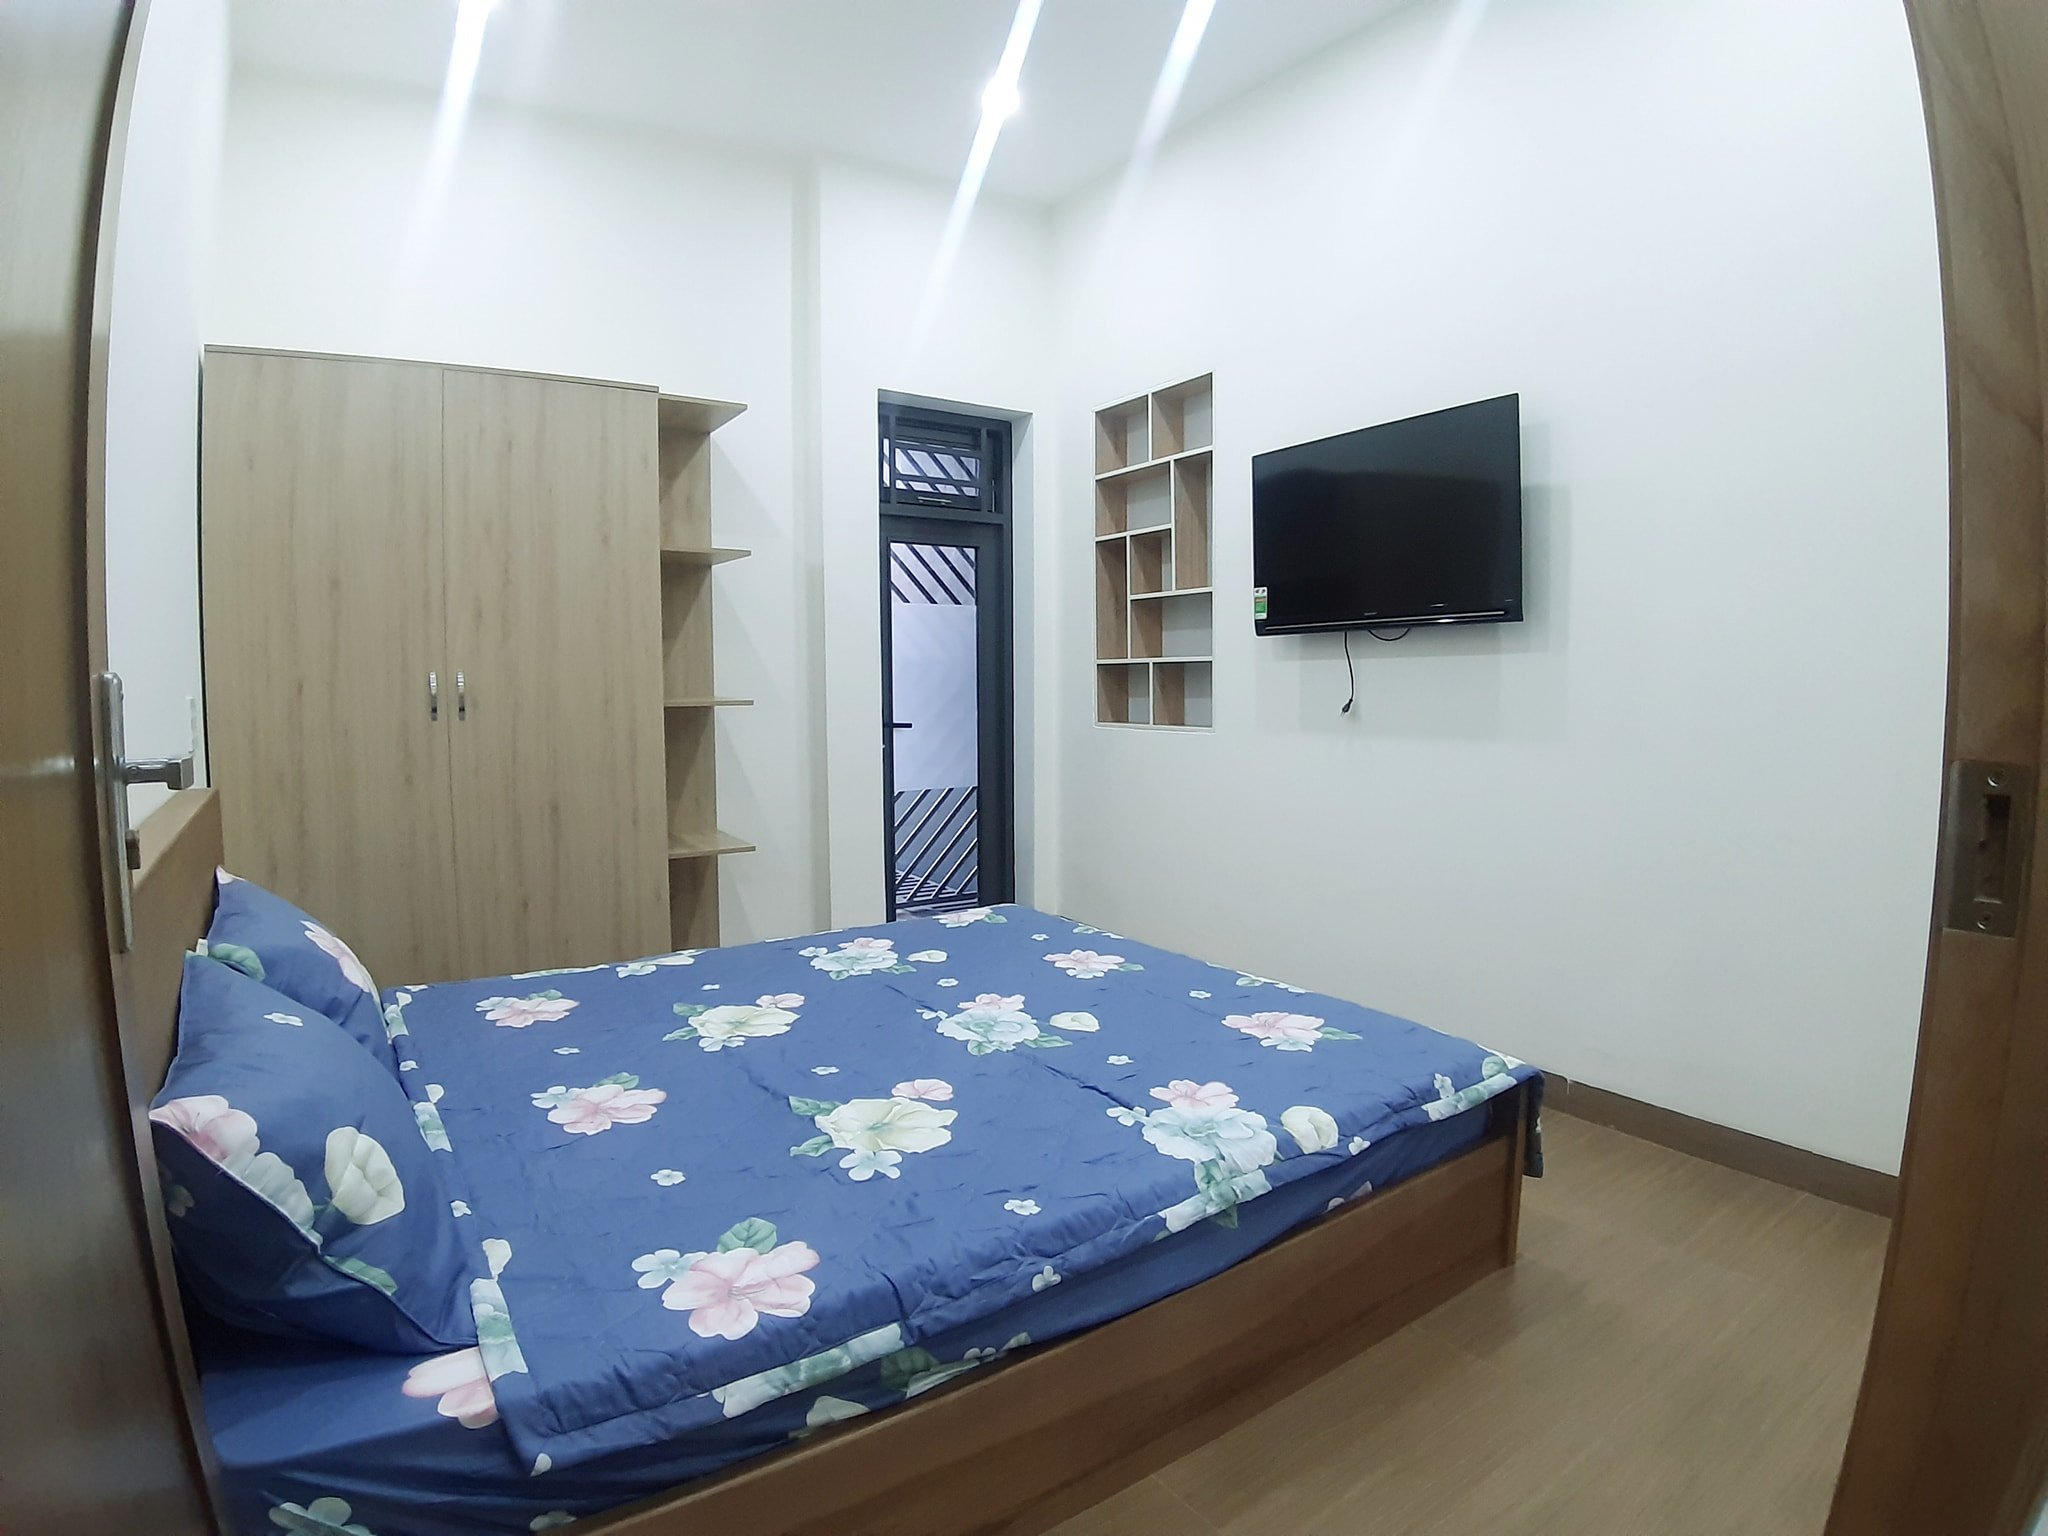 2 Bedrooms apartment for rent near My Khe beach Da Nang